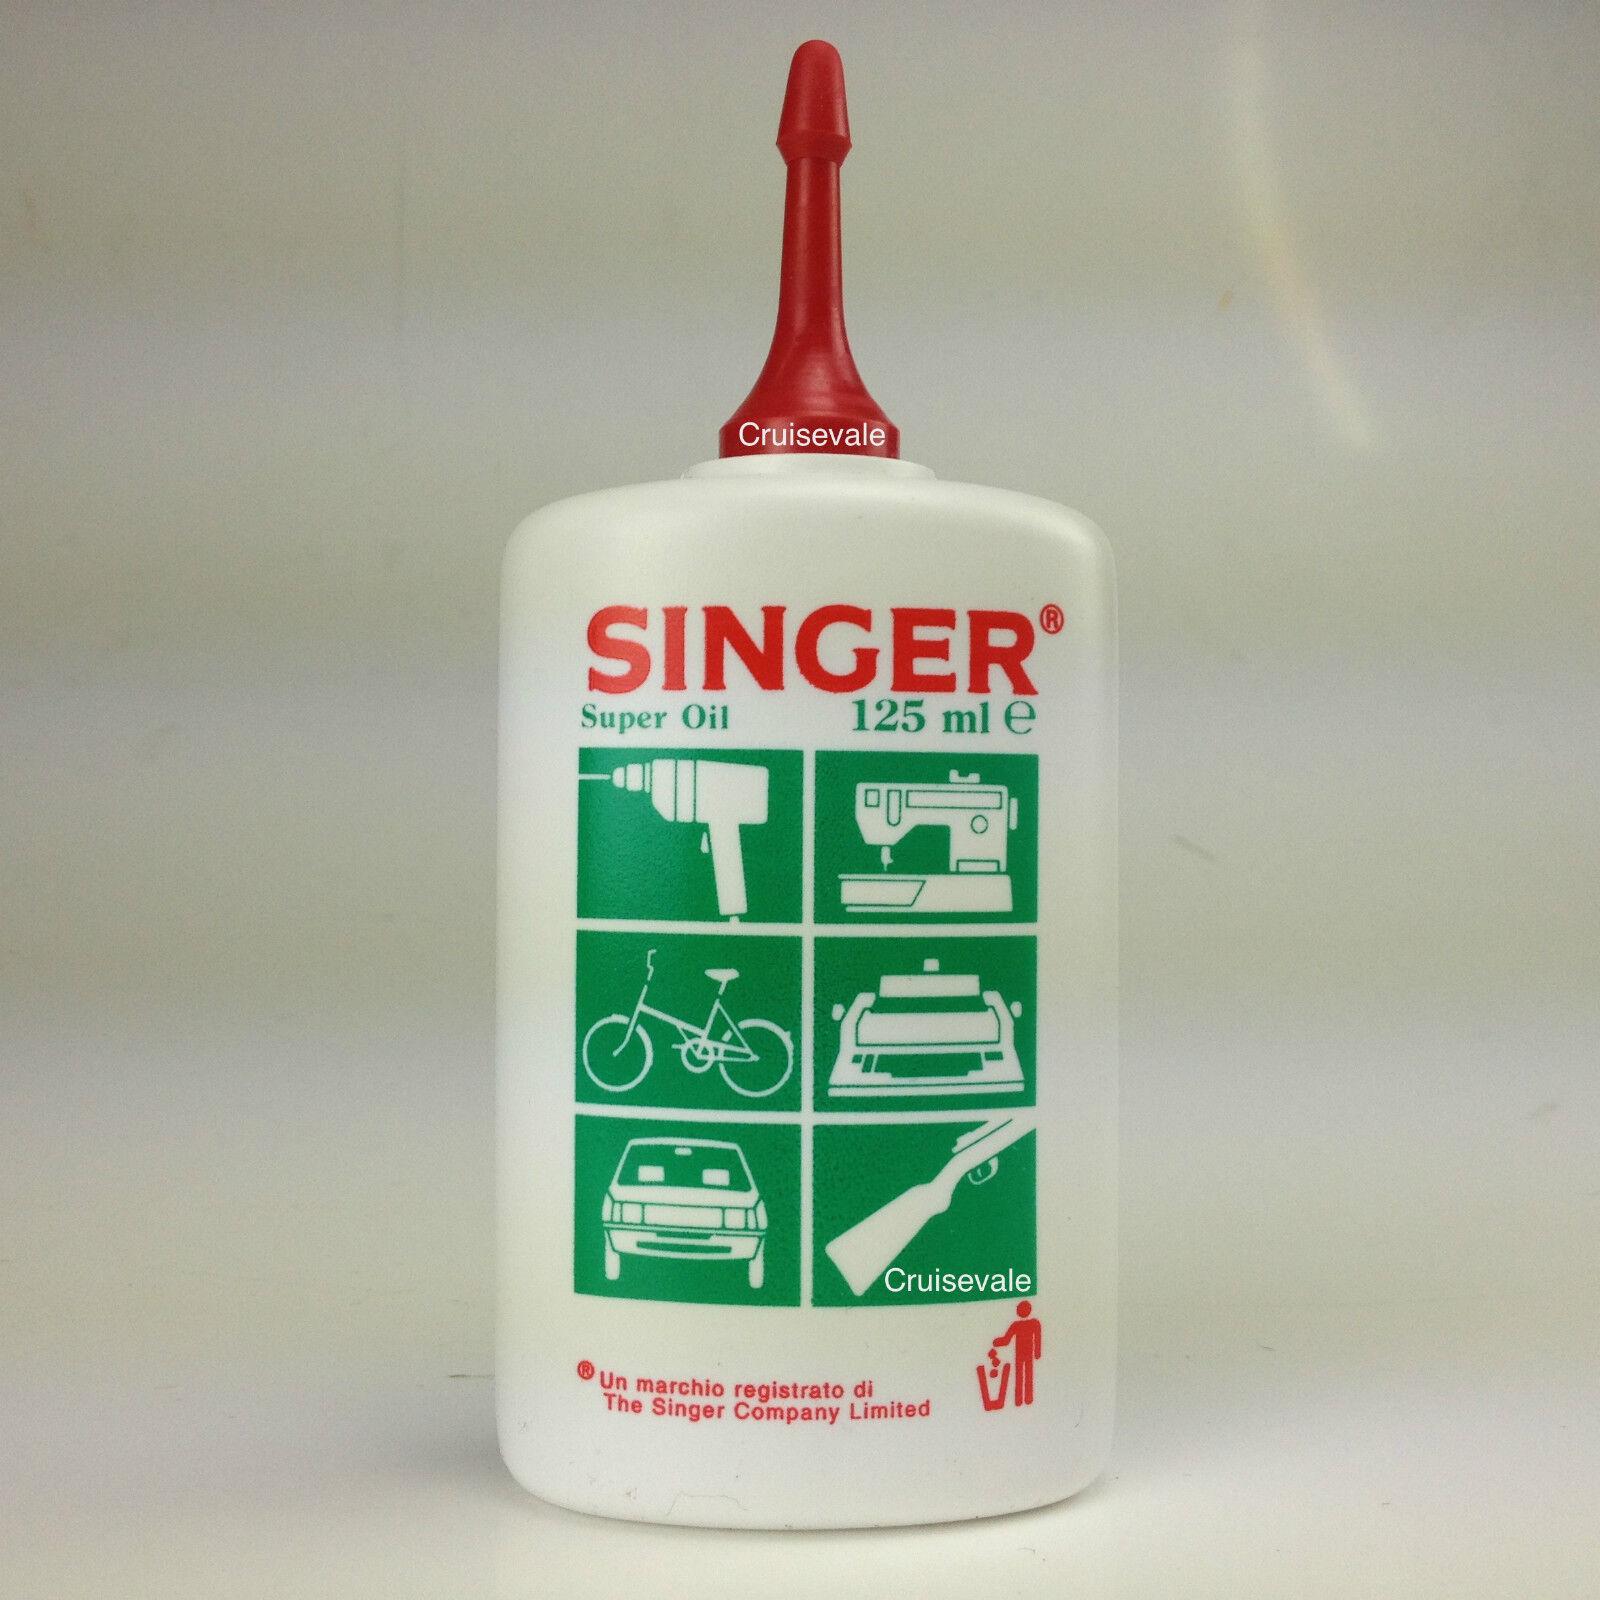 Knitting Oils : Singer sewing machine oil knitting ml